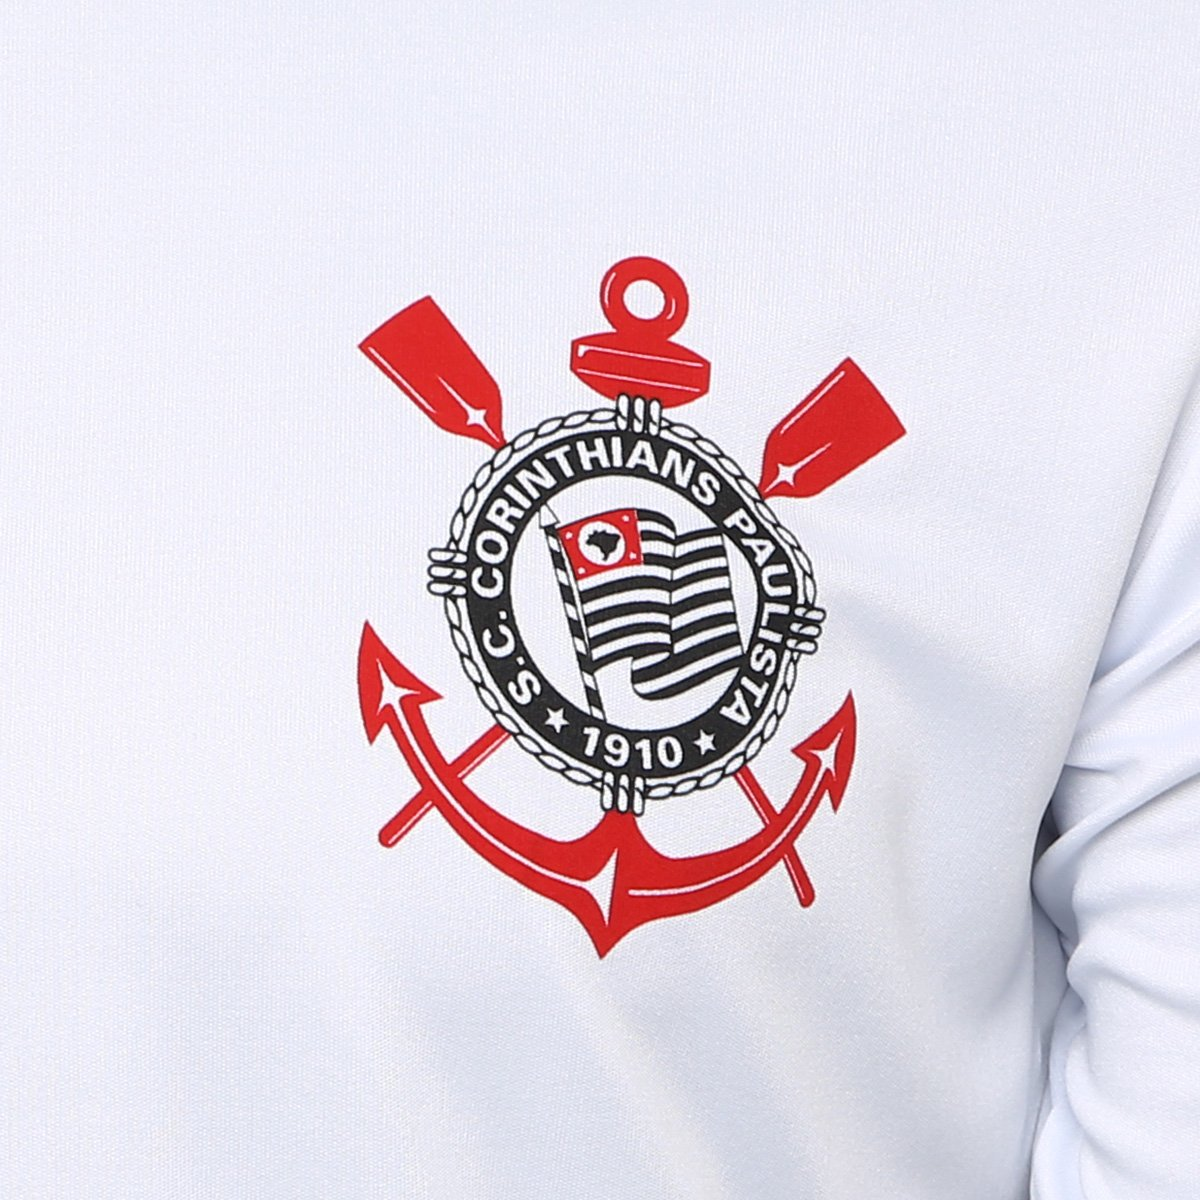 Camiseta Corinthians Réplica 1988 - Branco - Compre Agora  1c00768b2abdd